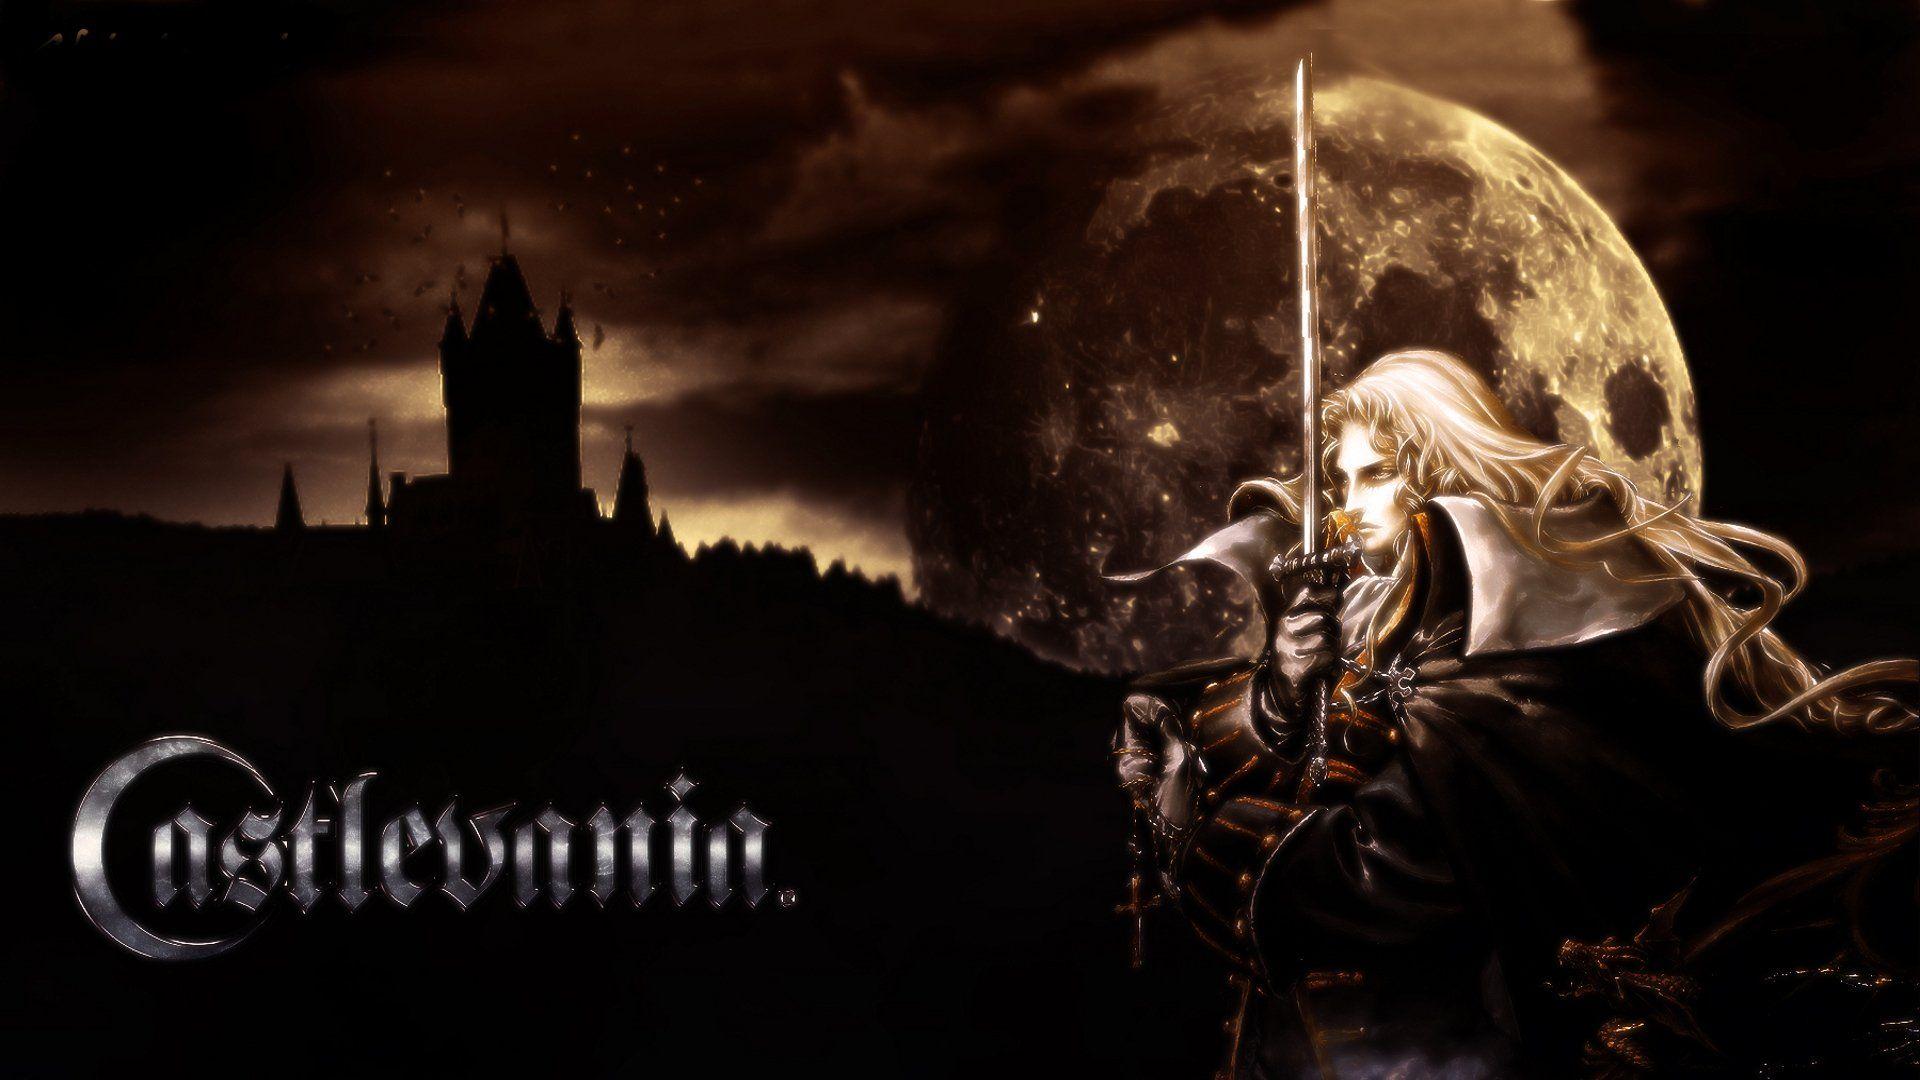 castlevania symphony of the night wallpaper castlevania crypt